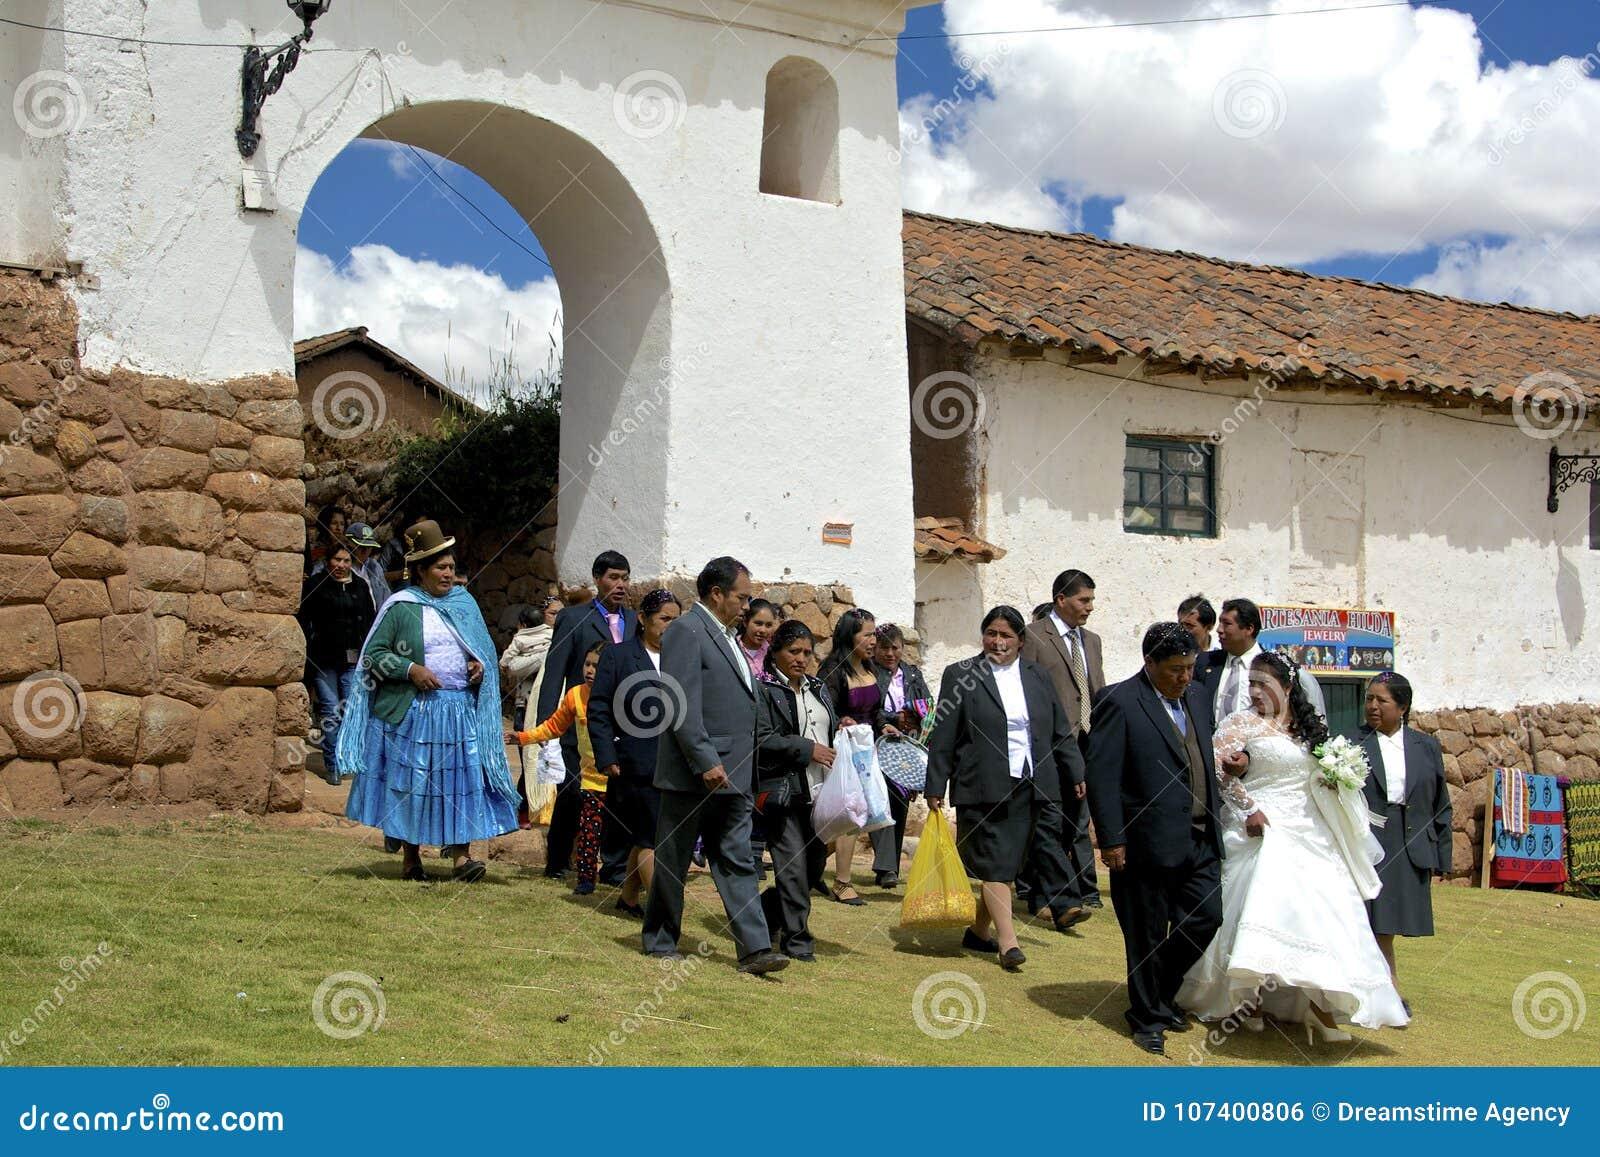 Matrimonio Catolico Tradicional : Boda quechua tradicional perú foto editorial imagen de